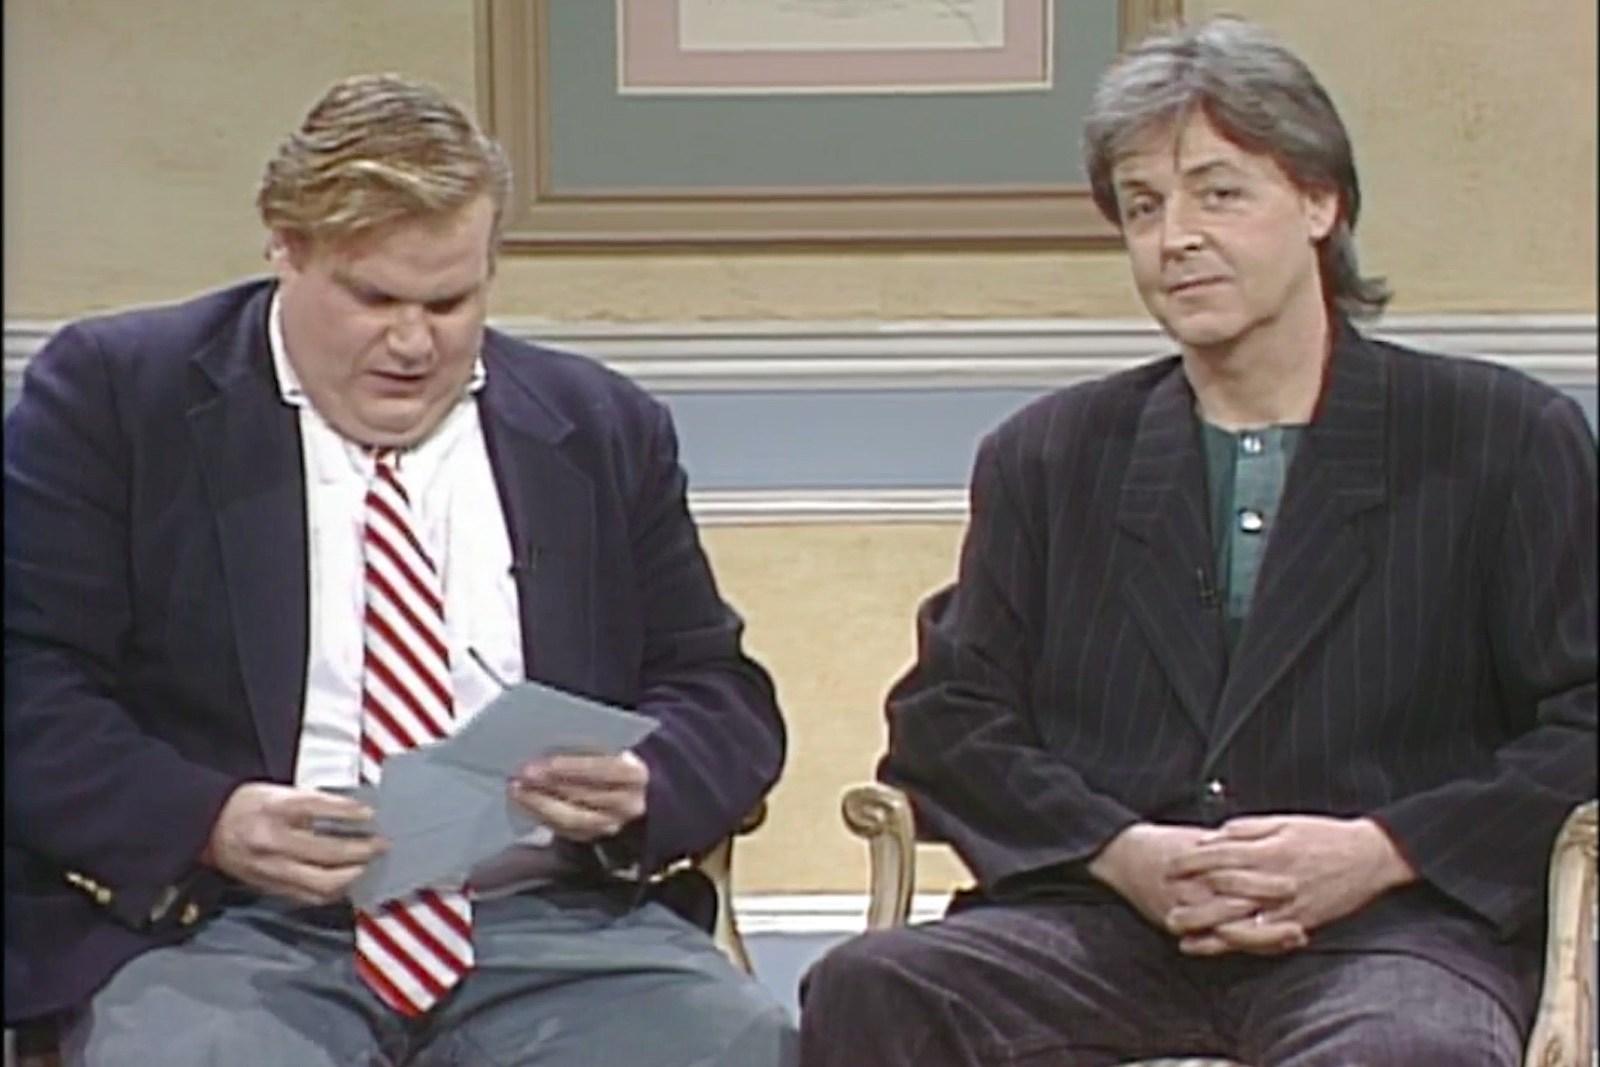 when chris farley interviewed paul mccartney on snl